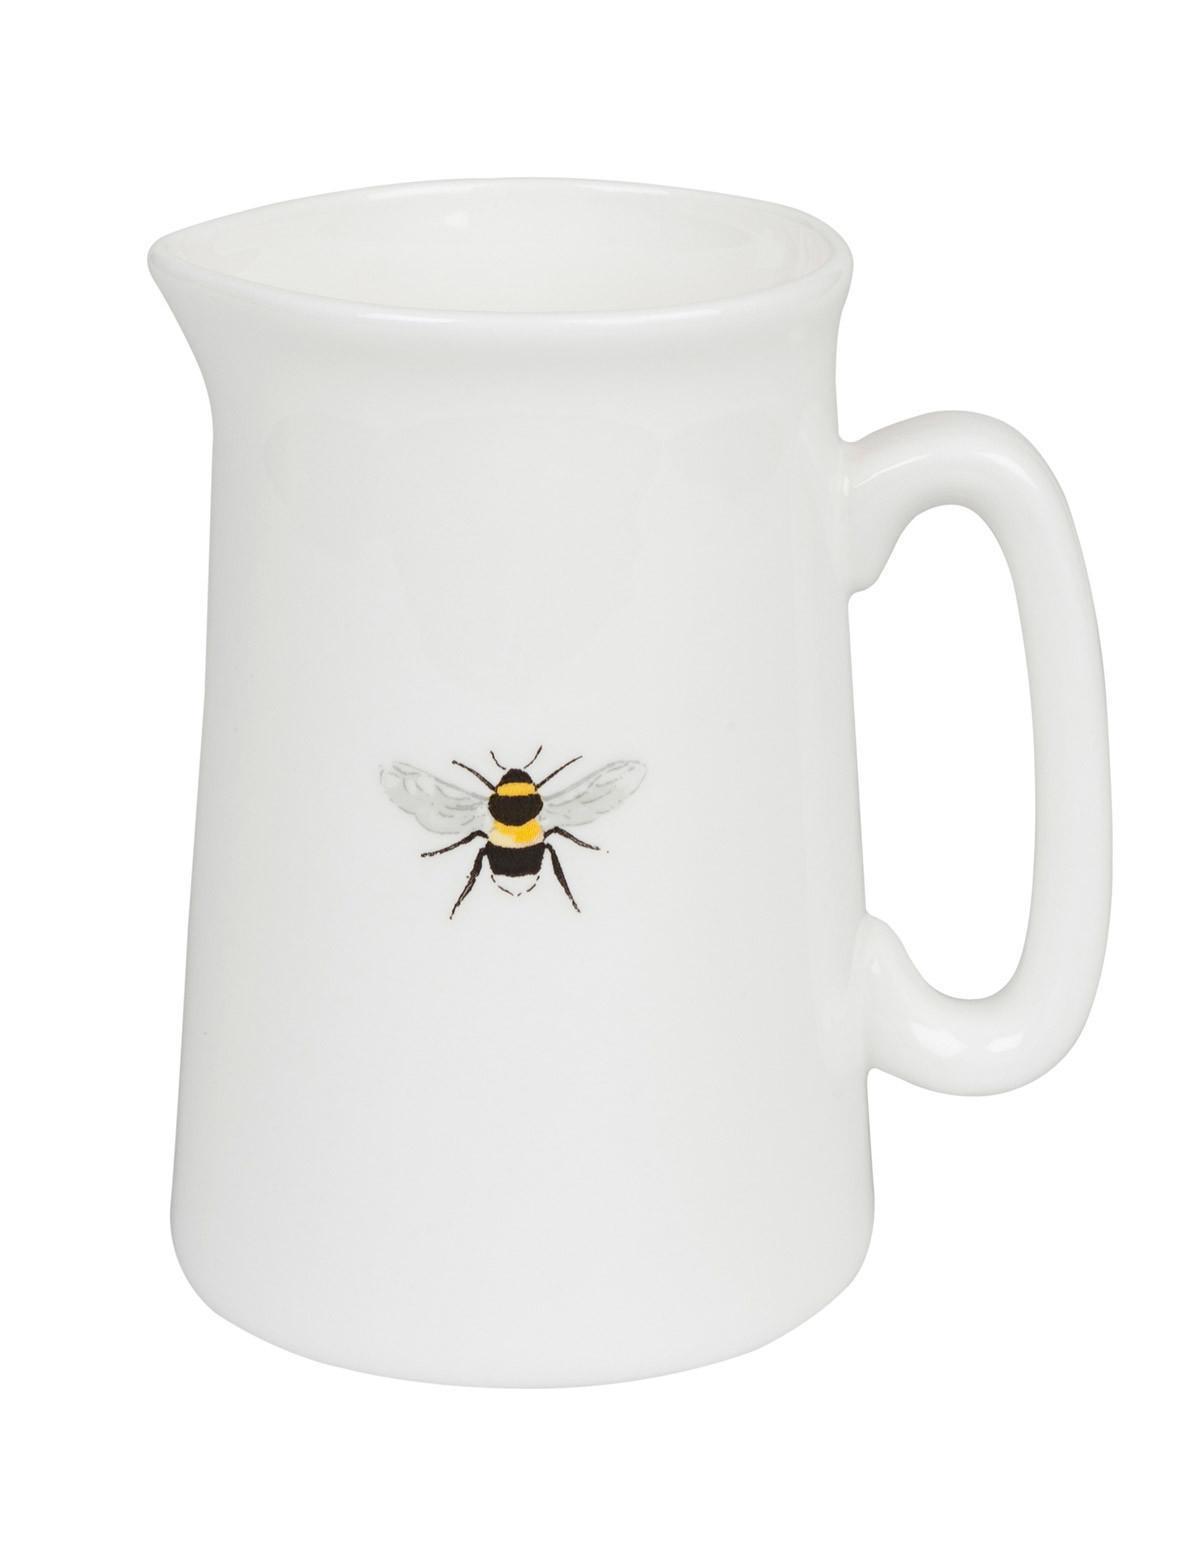 sophie allport mini bee jug